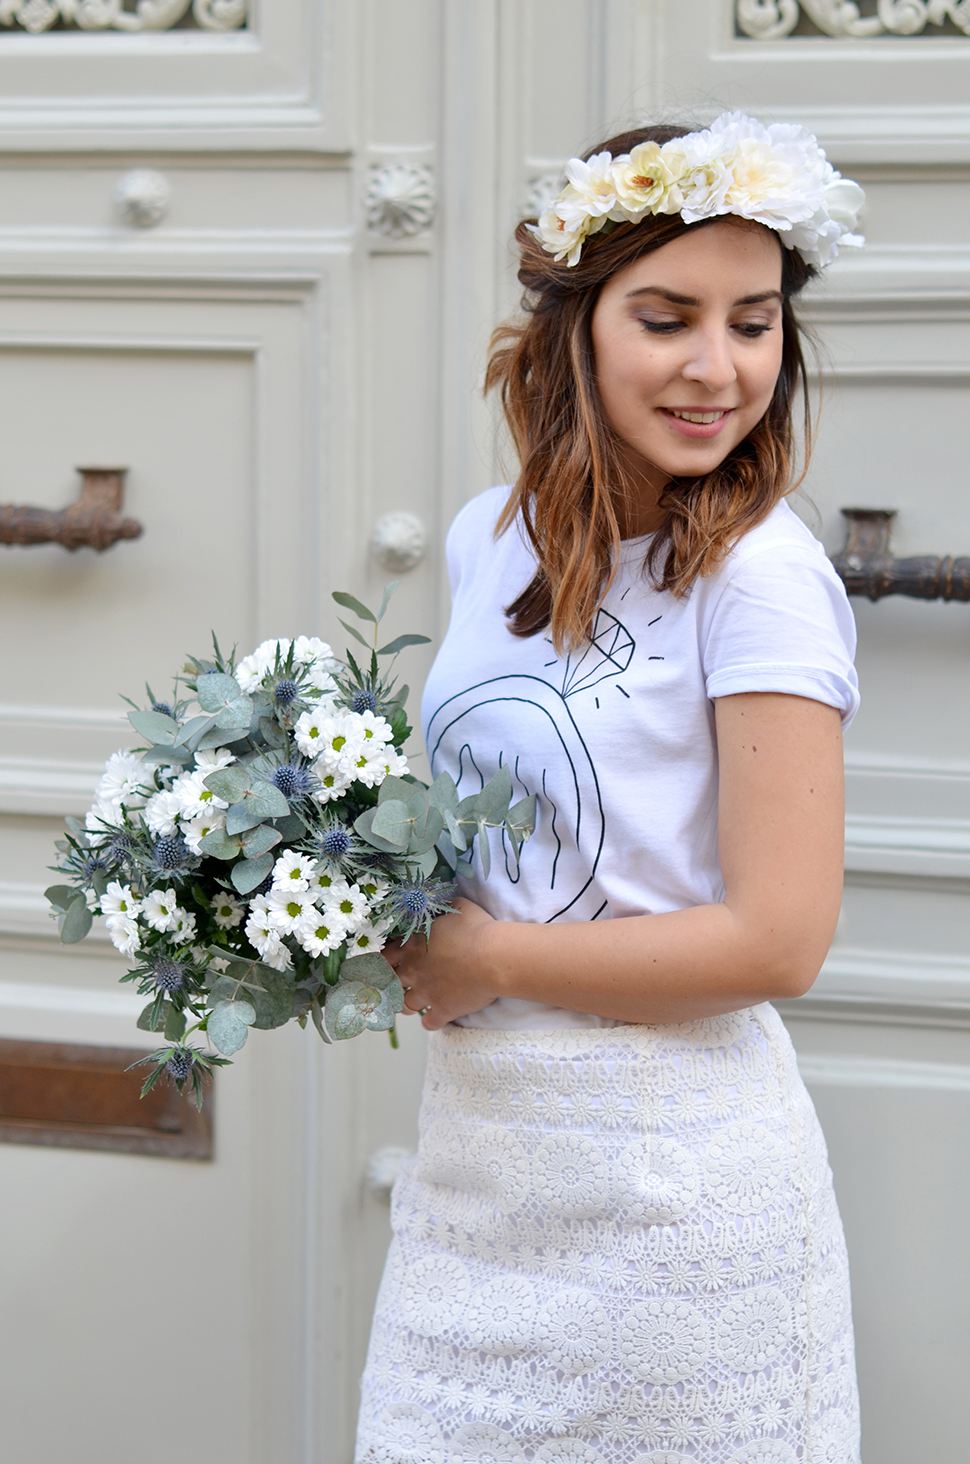 Helloitsvalentine_WeddingIRL_Showroomprive_11